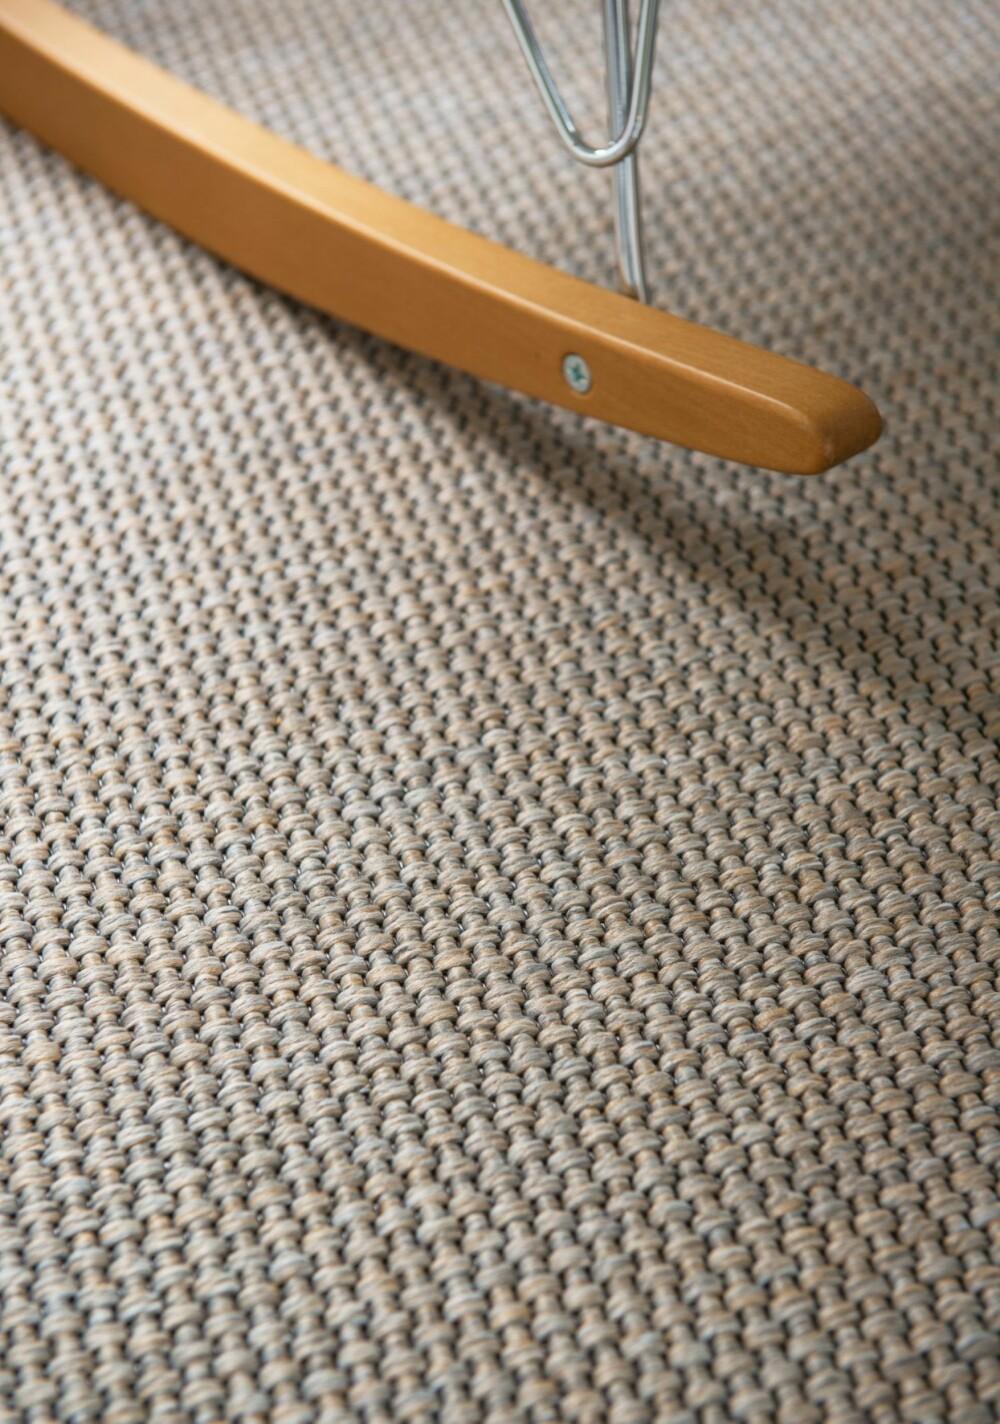 VEGG-TIL-VEGG-TEPPE: Familien ønsket teppe for komfortens skyld. Men det skulle ikke være loete, og ikke for kontoraktig. Valget falt på Cantana Essence fra Ege gulv.